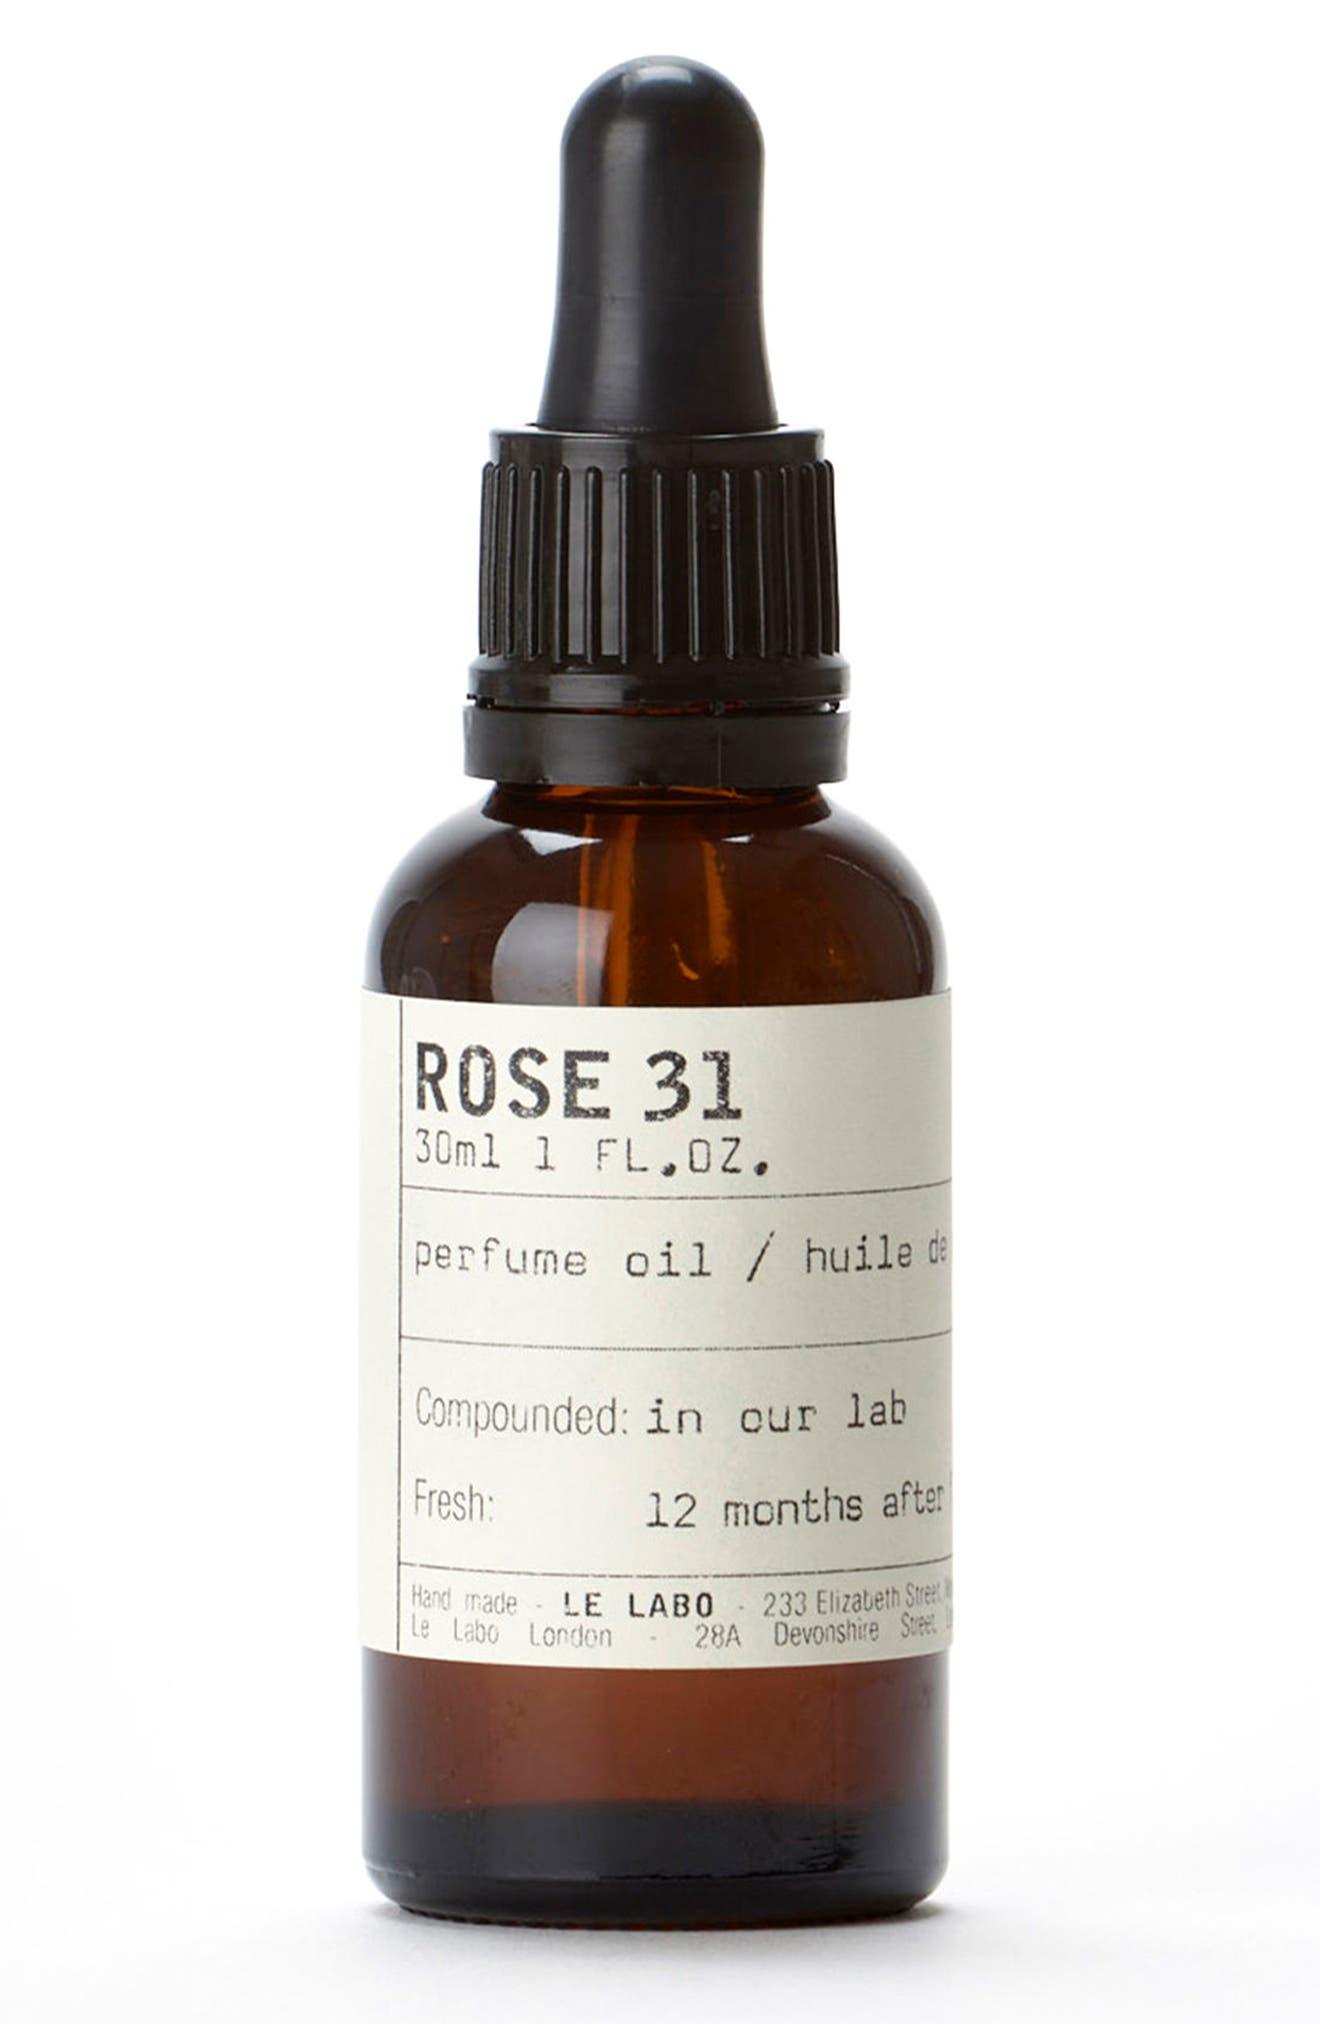 Rose 31 Perfume Oil